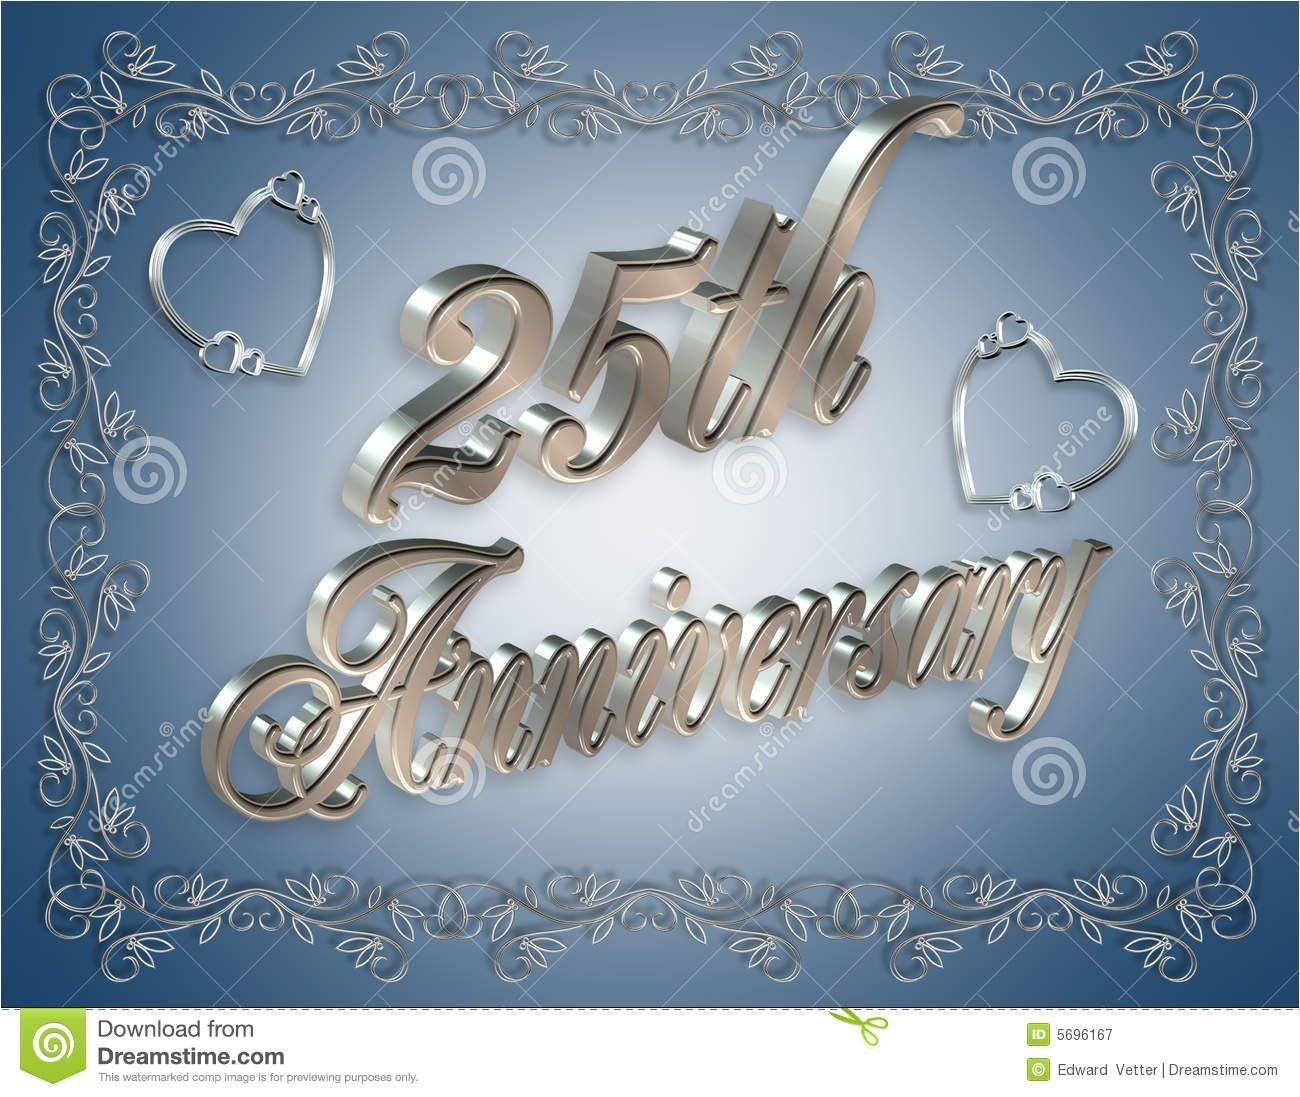 25th Wedding Anniversary Invitation Cards Free Download 25th Wedding Anniversary Cards Free Download Google